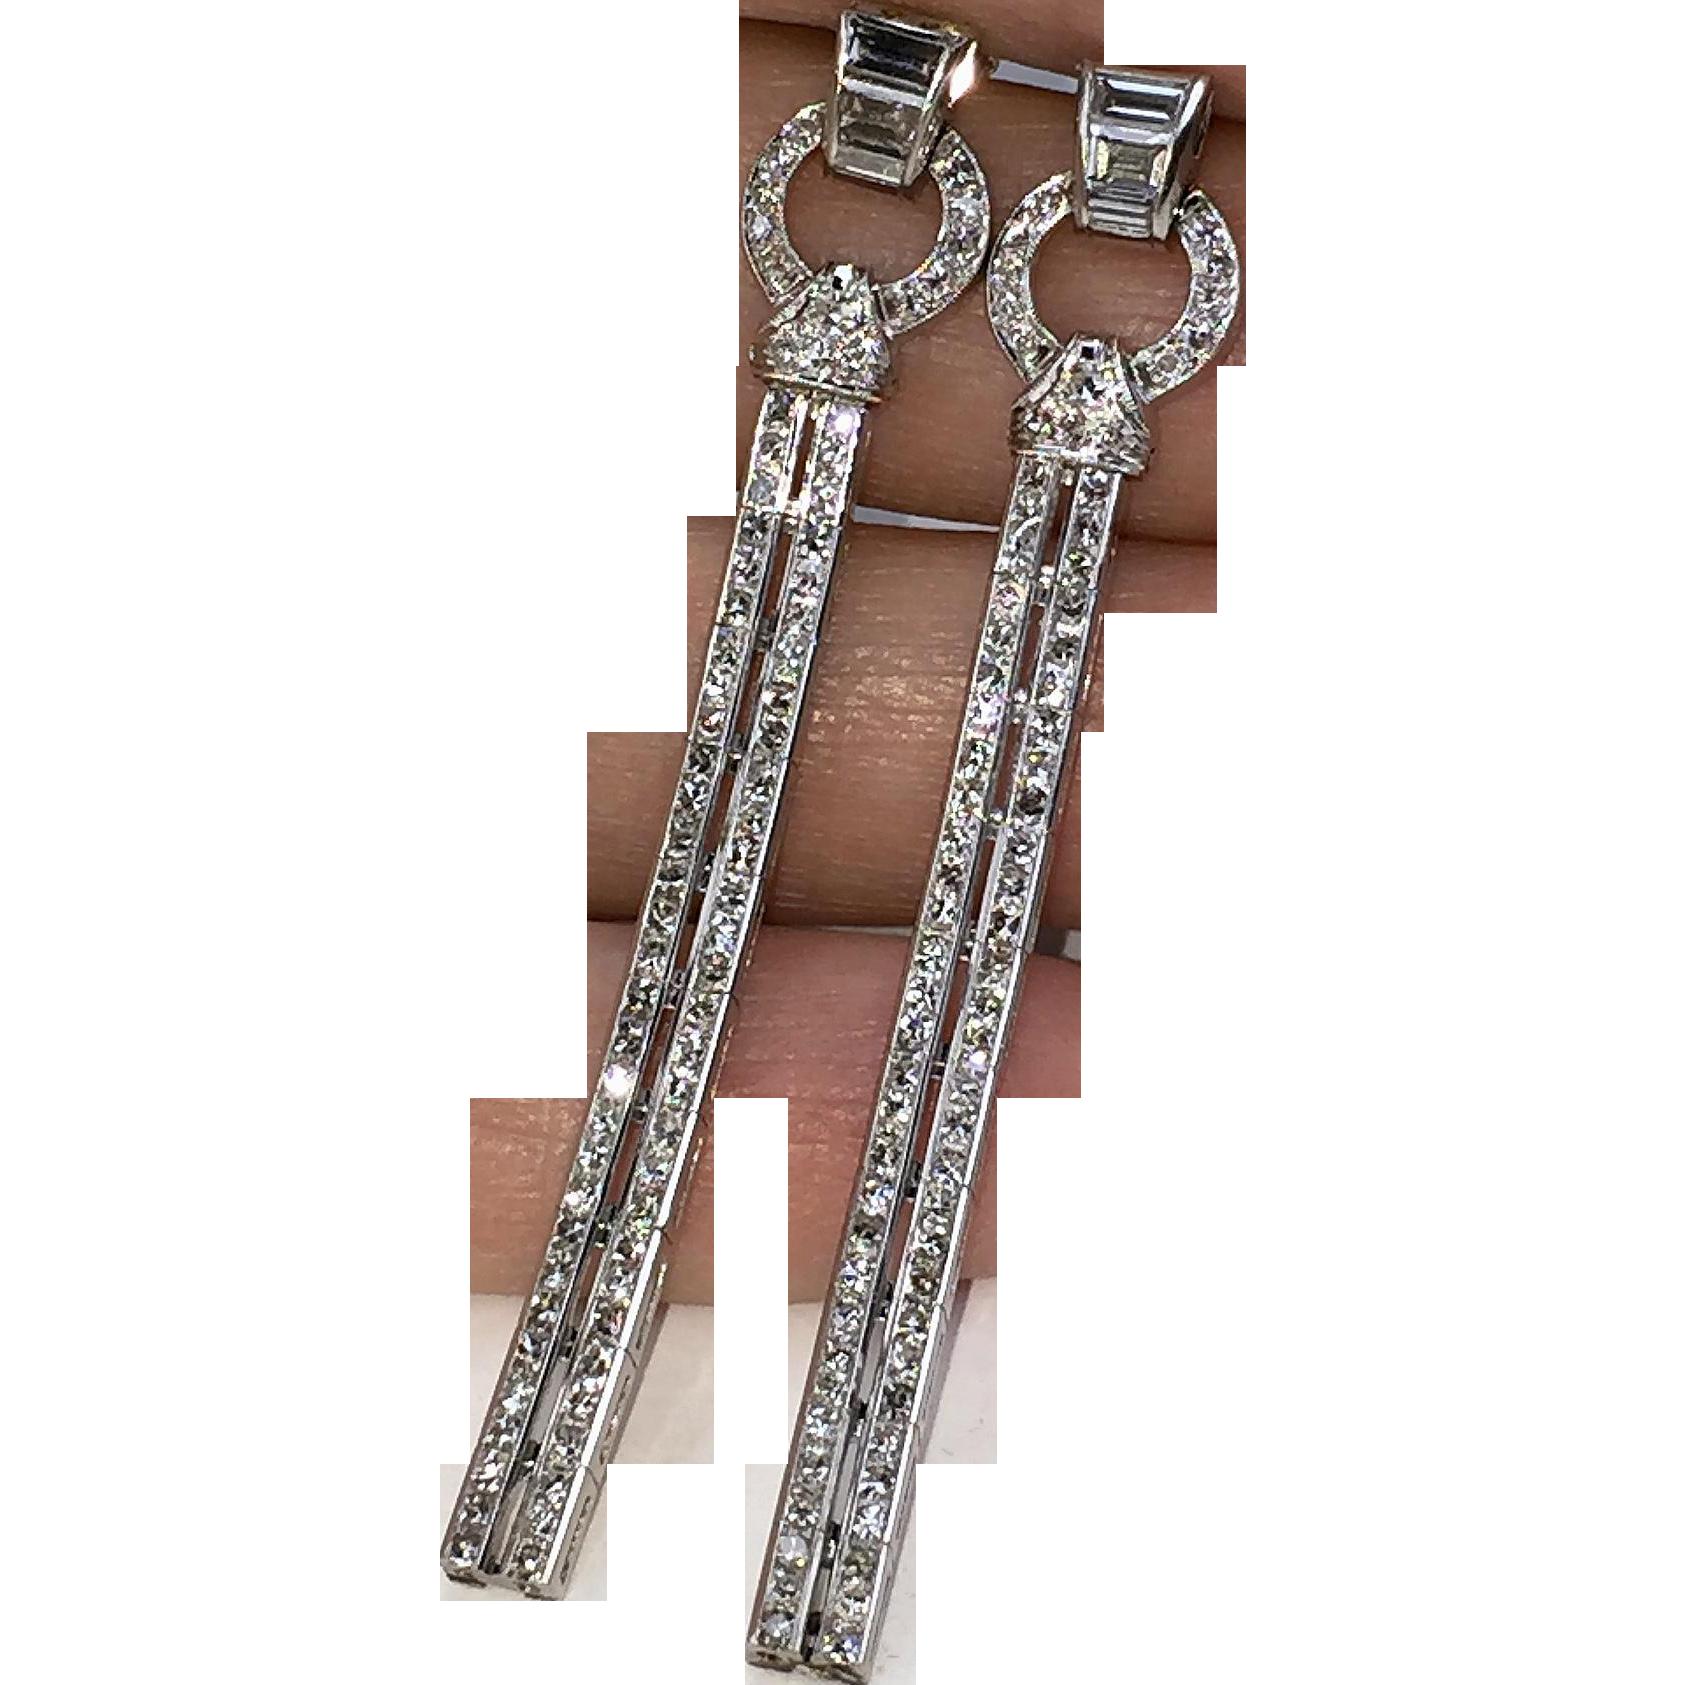 Magnificent Platinum ART DECO Diamond Drop Earrings